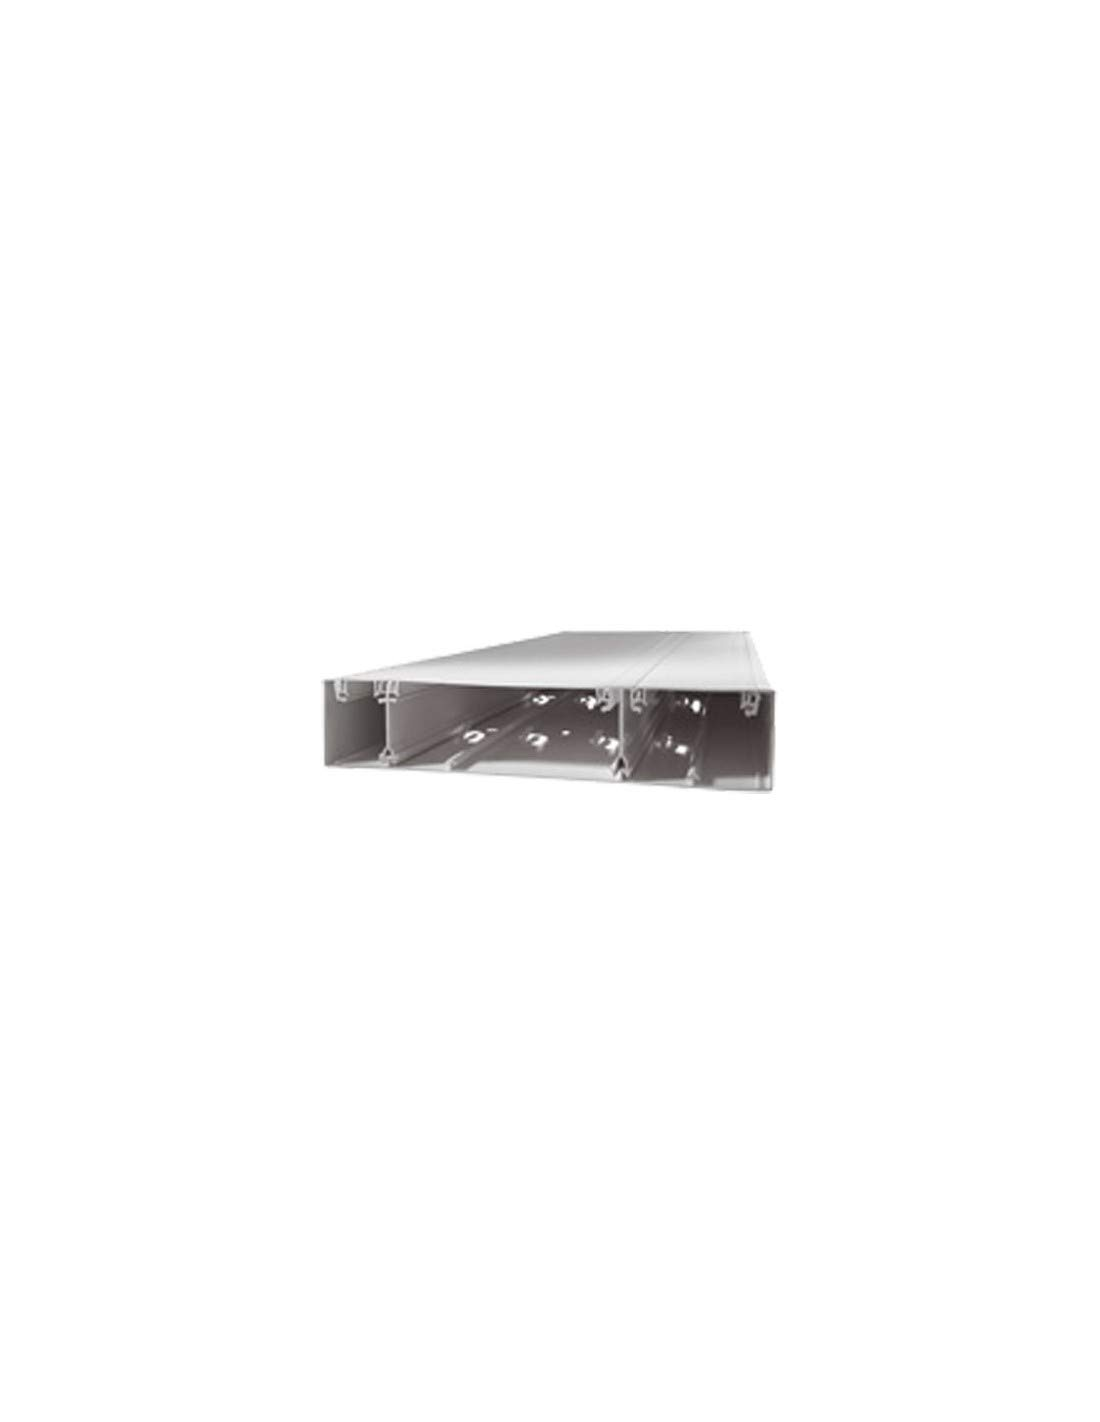 Legrand-Canaleta embellecedores completa PREMIUM 18 legrand DRIVIA 3 tapas-30068: Amazon.es: Amazon.es